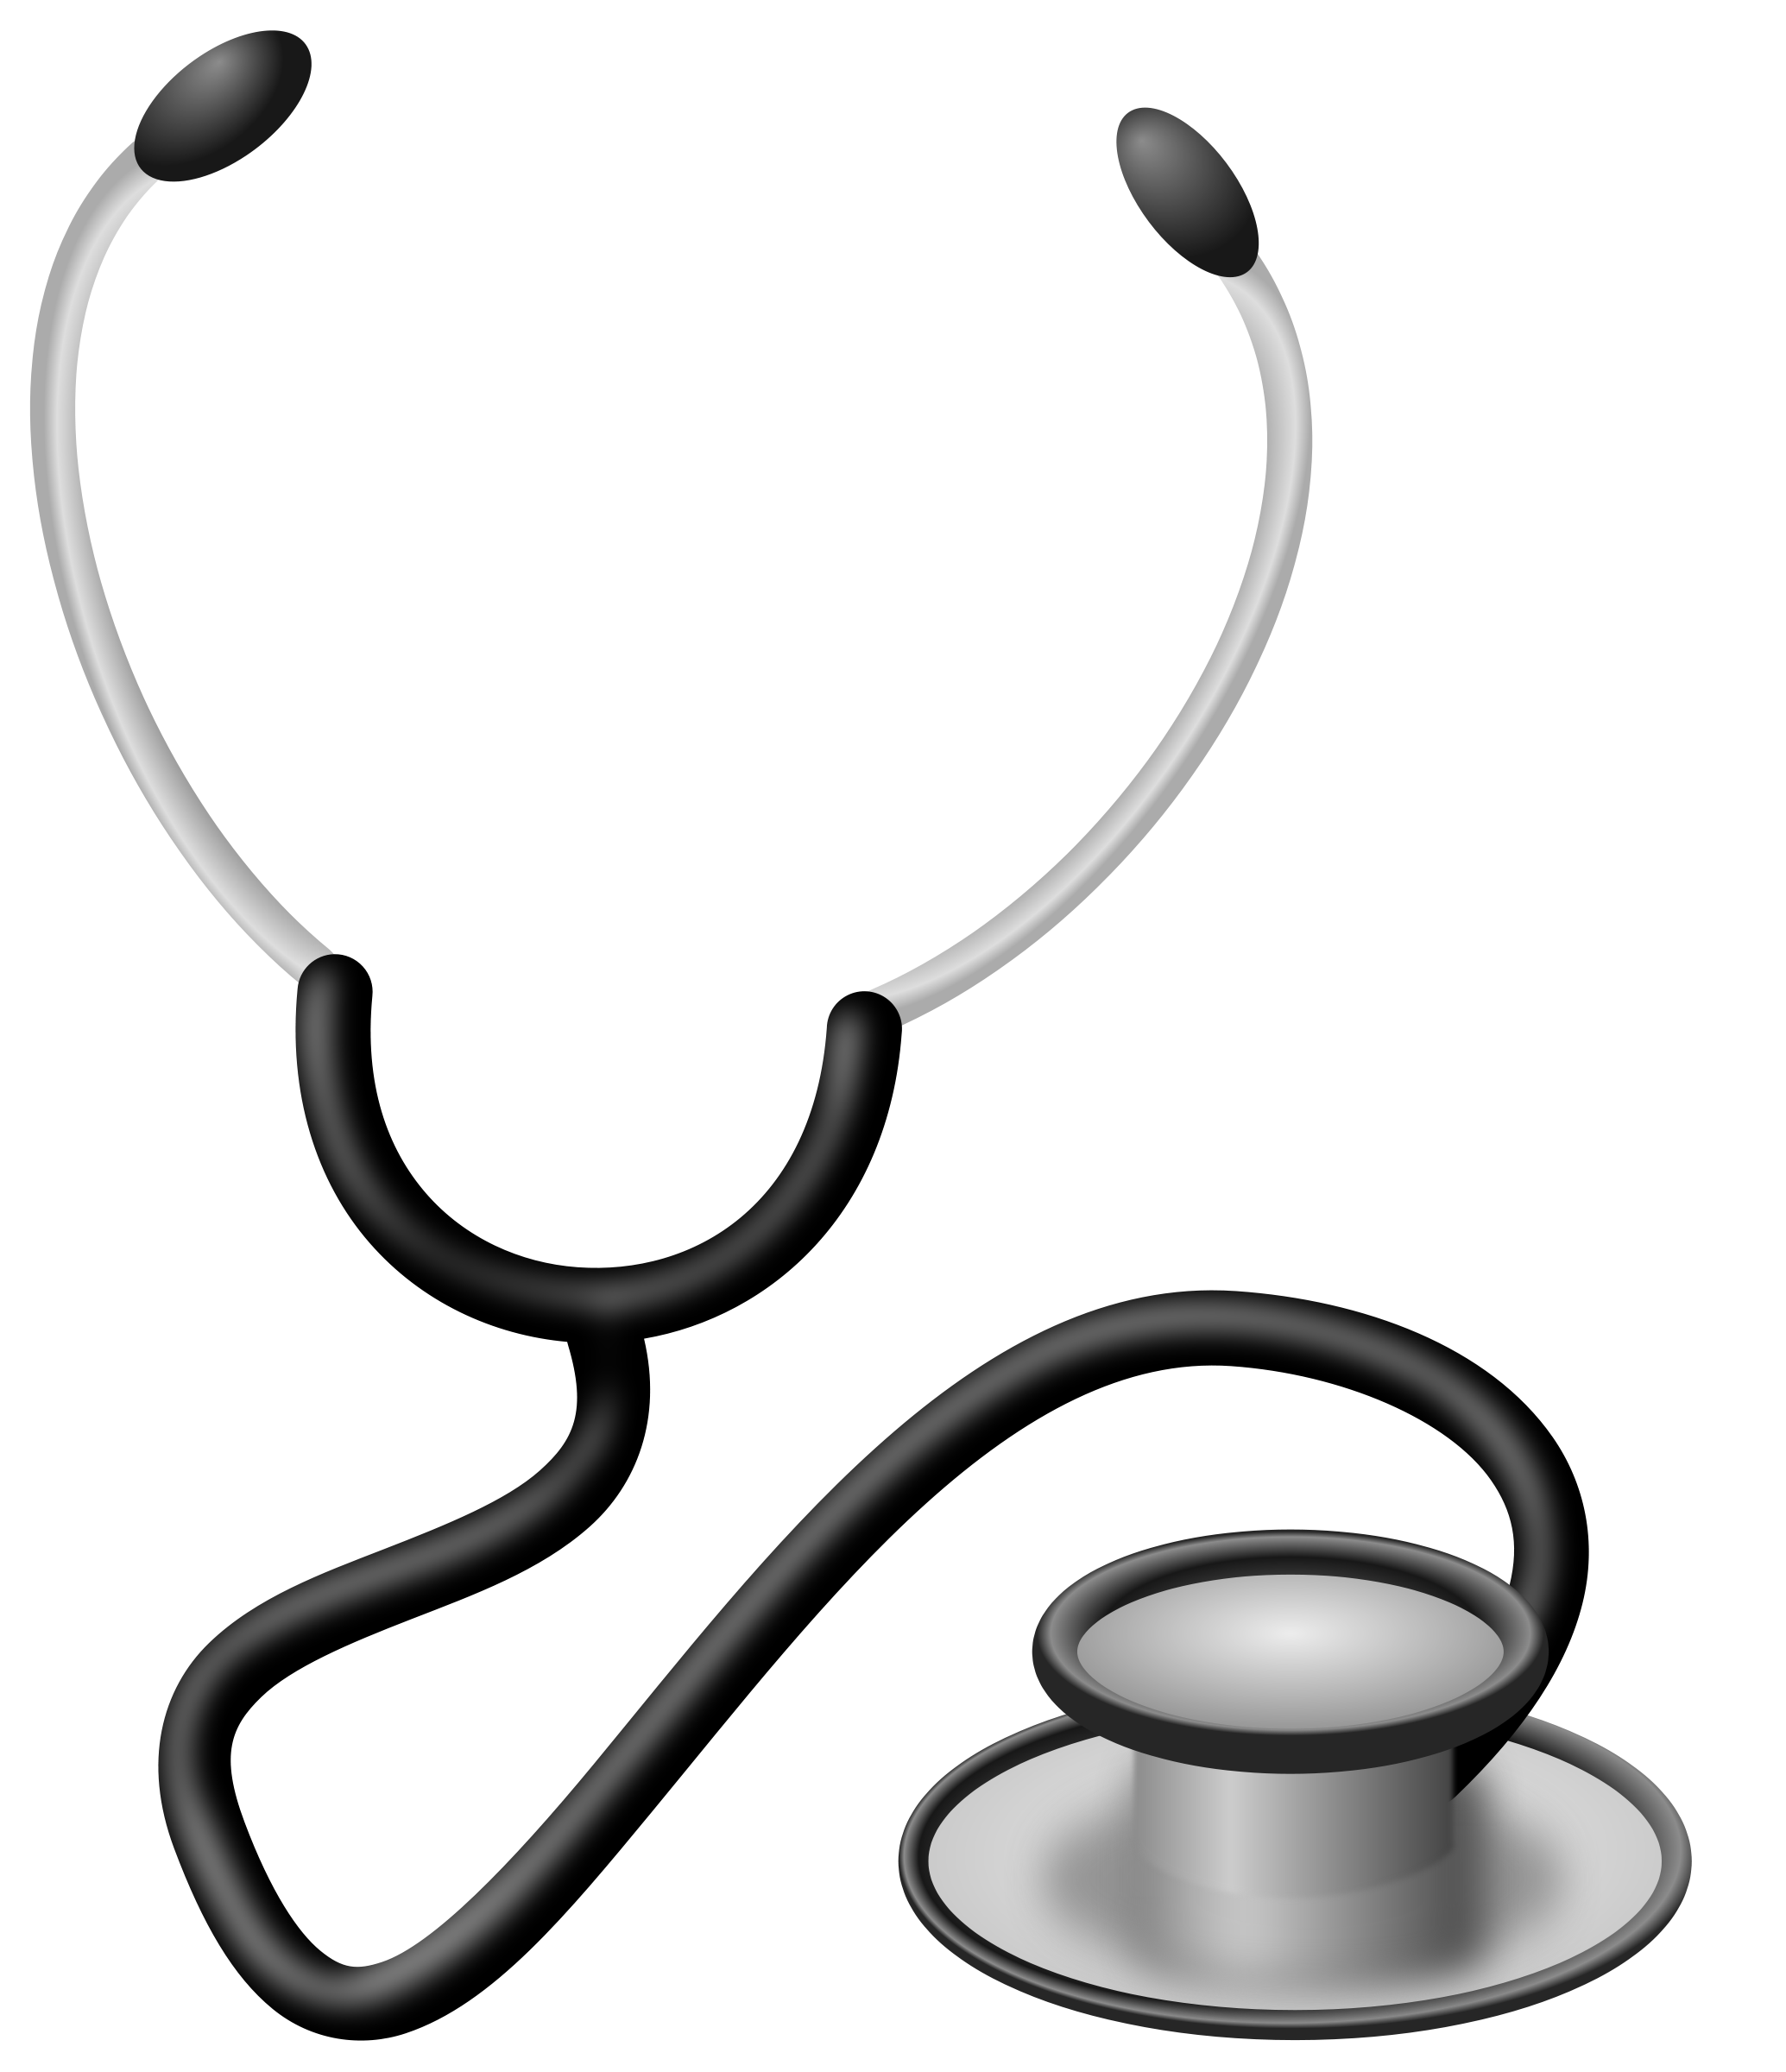 Clip art images panda. Heartbeat clipart stethoscope